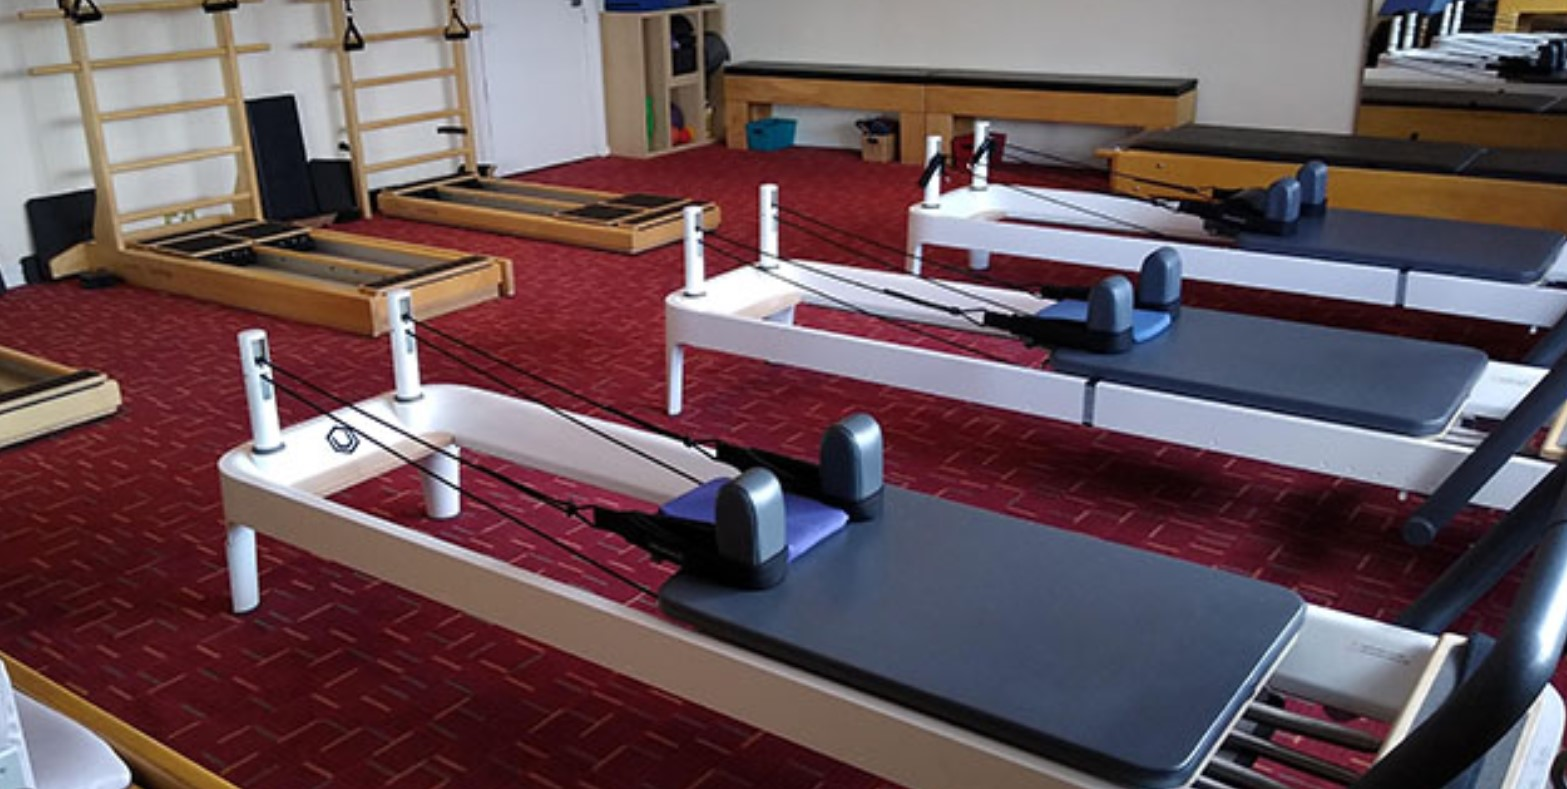 Leeds Pilates Centre